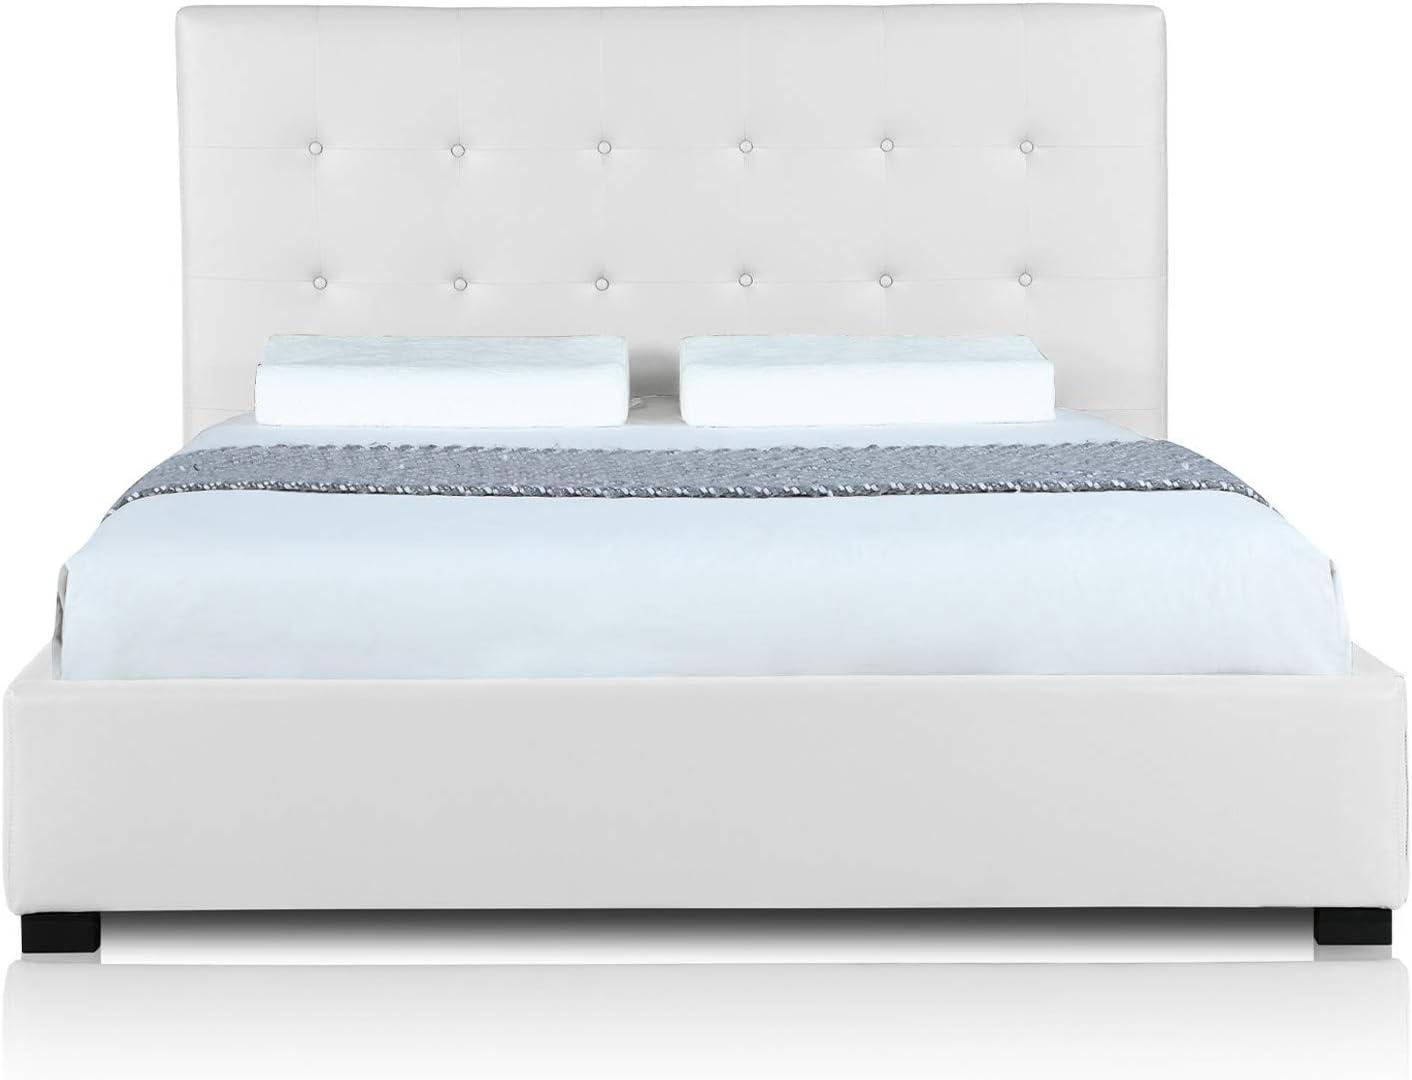 INTENSEDECO Intense Déco – Cama baúl Layton + somier 160 cm Color Blanco